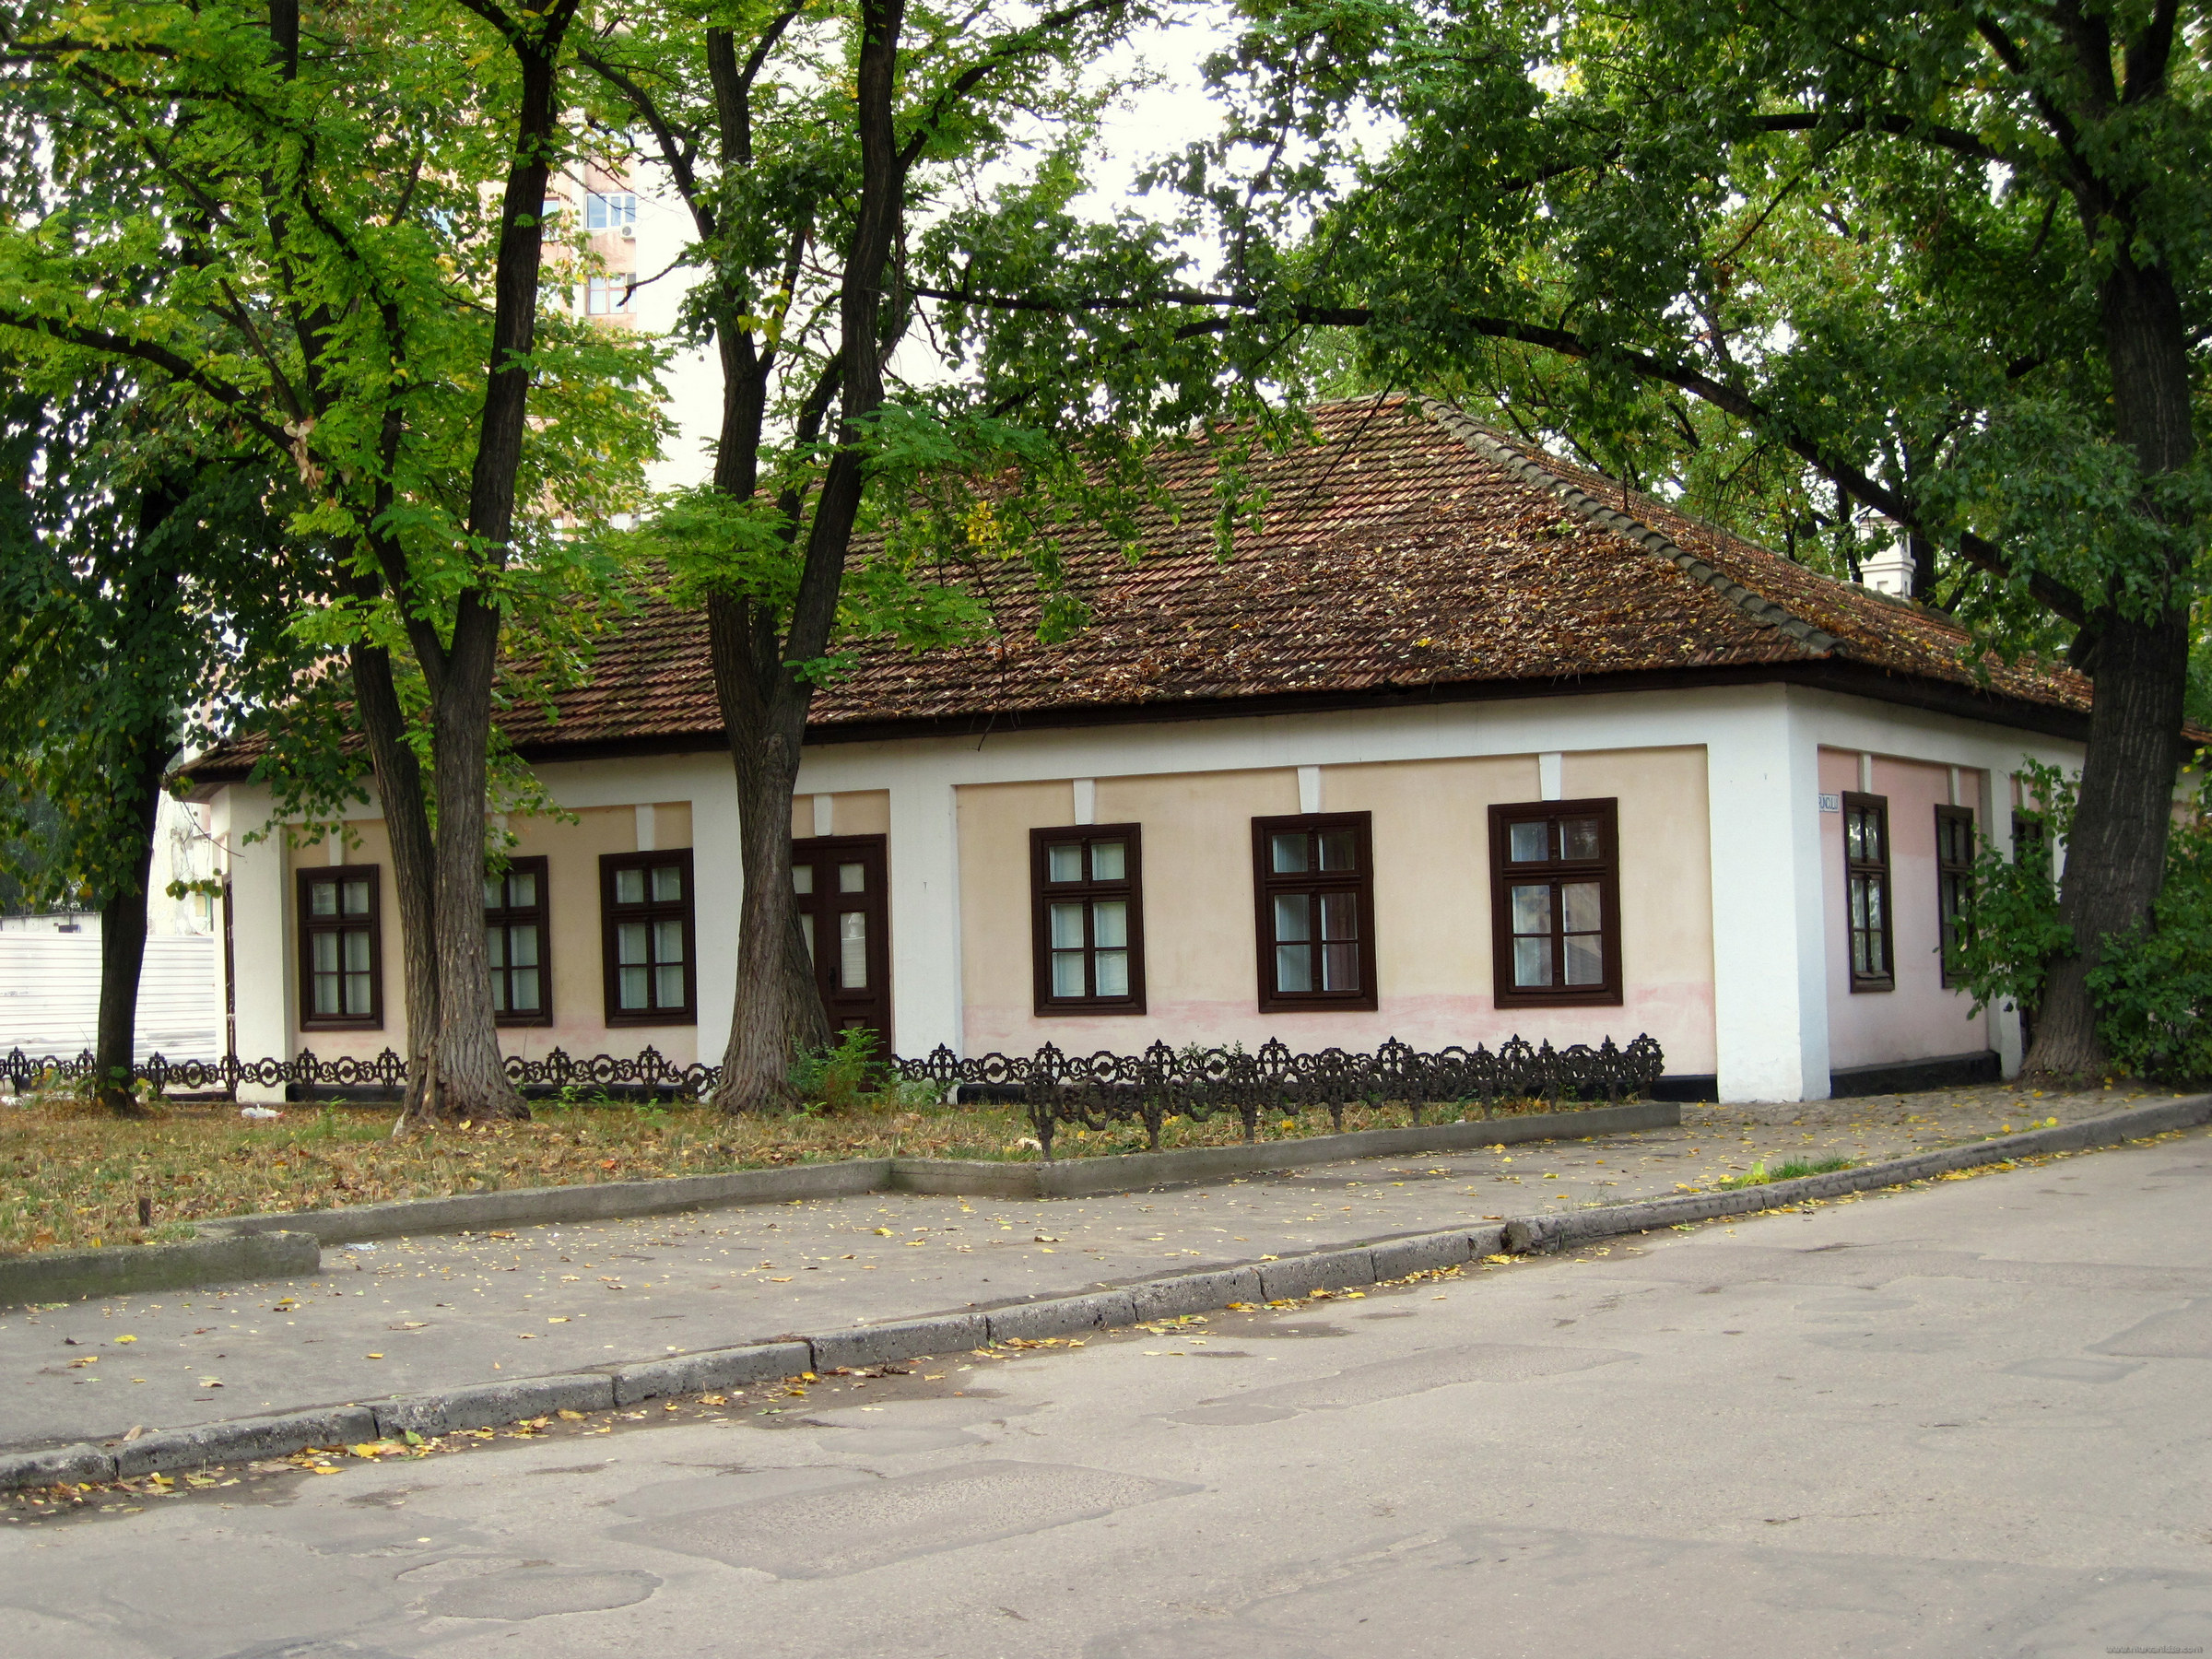 A.S. Pushkin house in Chisinau